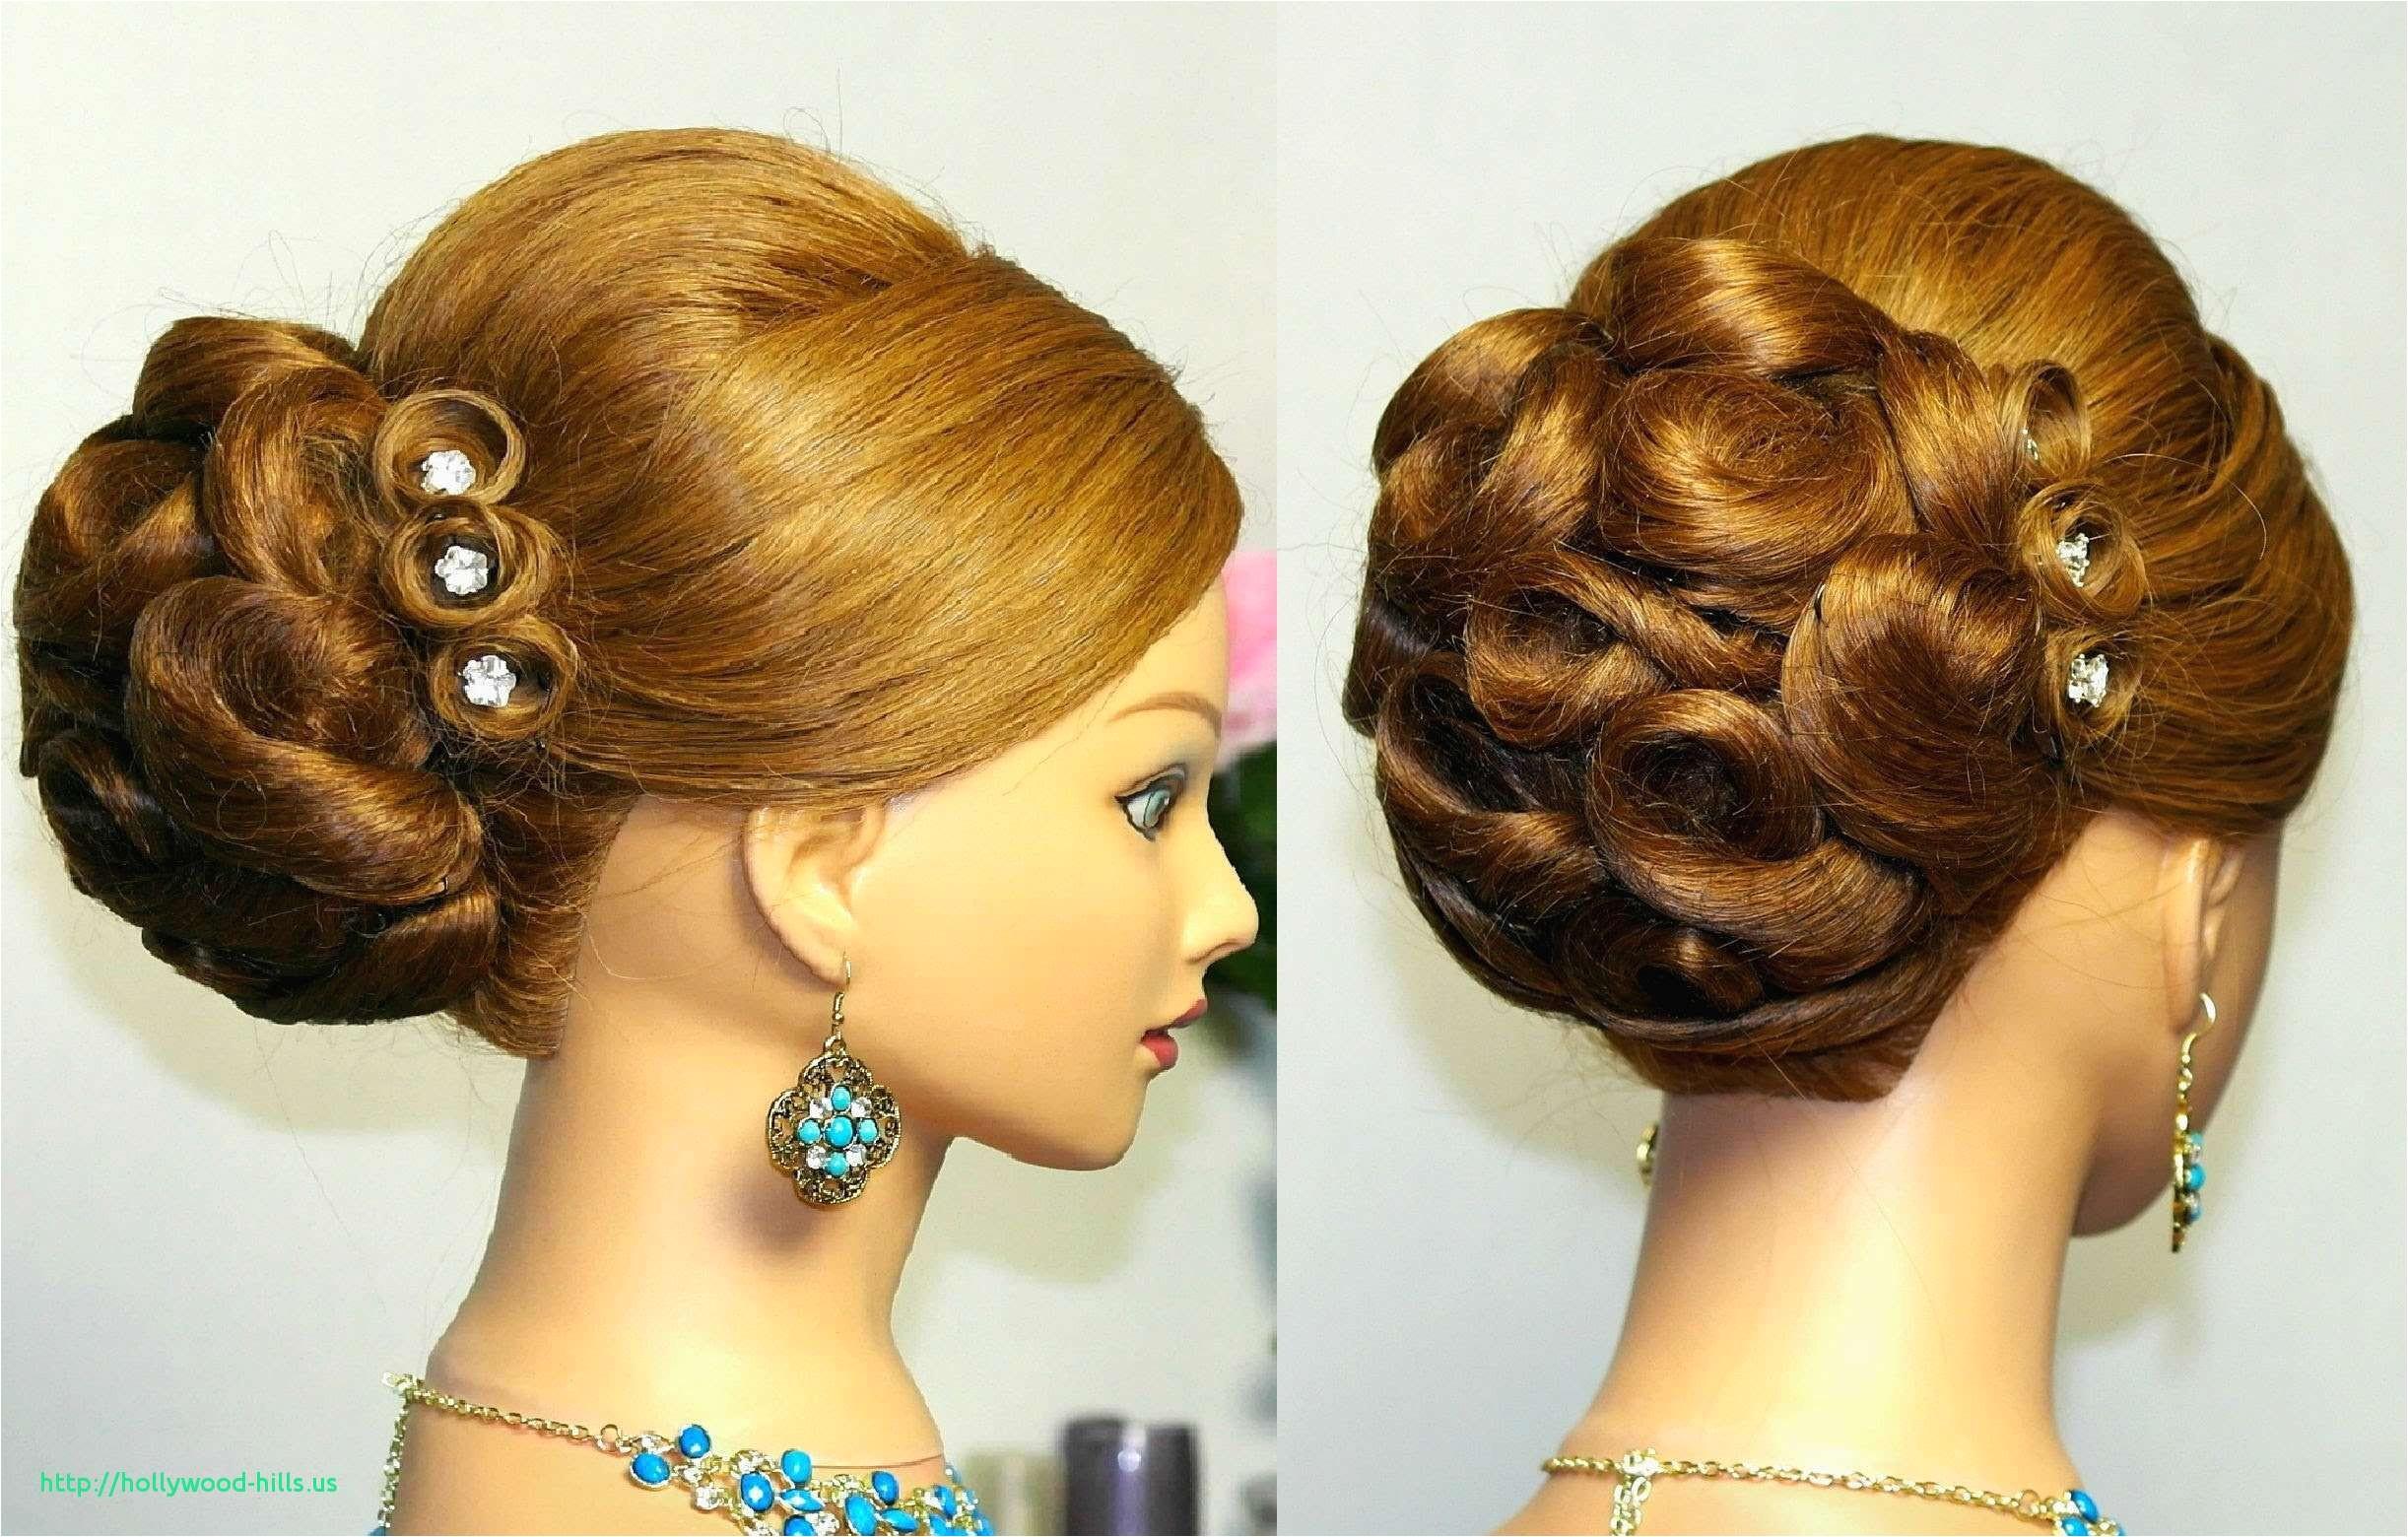 Little Girls Hairstyles for Weddings Fresh Easy Cute Hairstyles for Little Girls with Long Hair